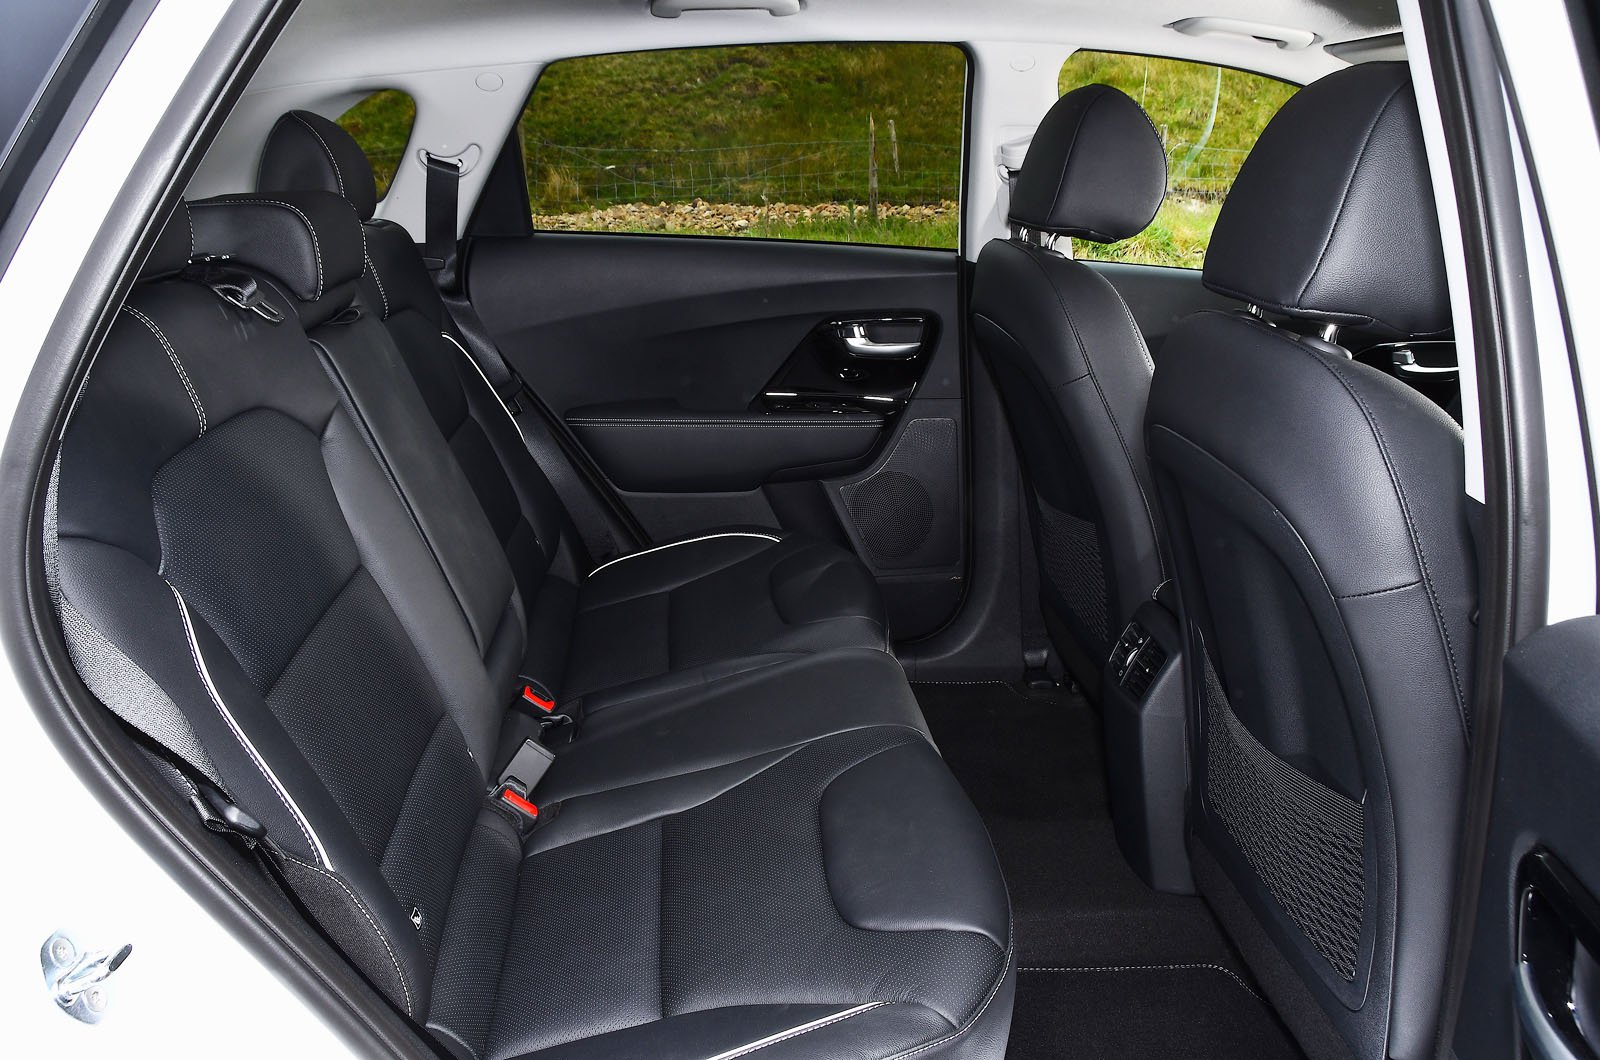 Kia e-Niro 2021 rear seats